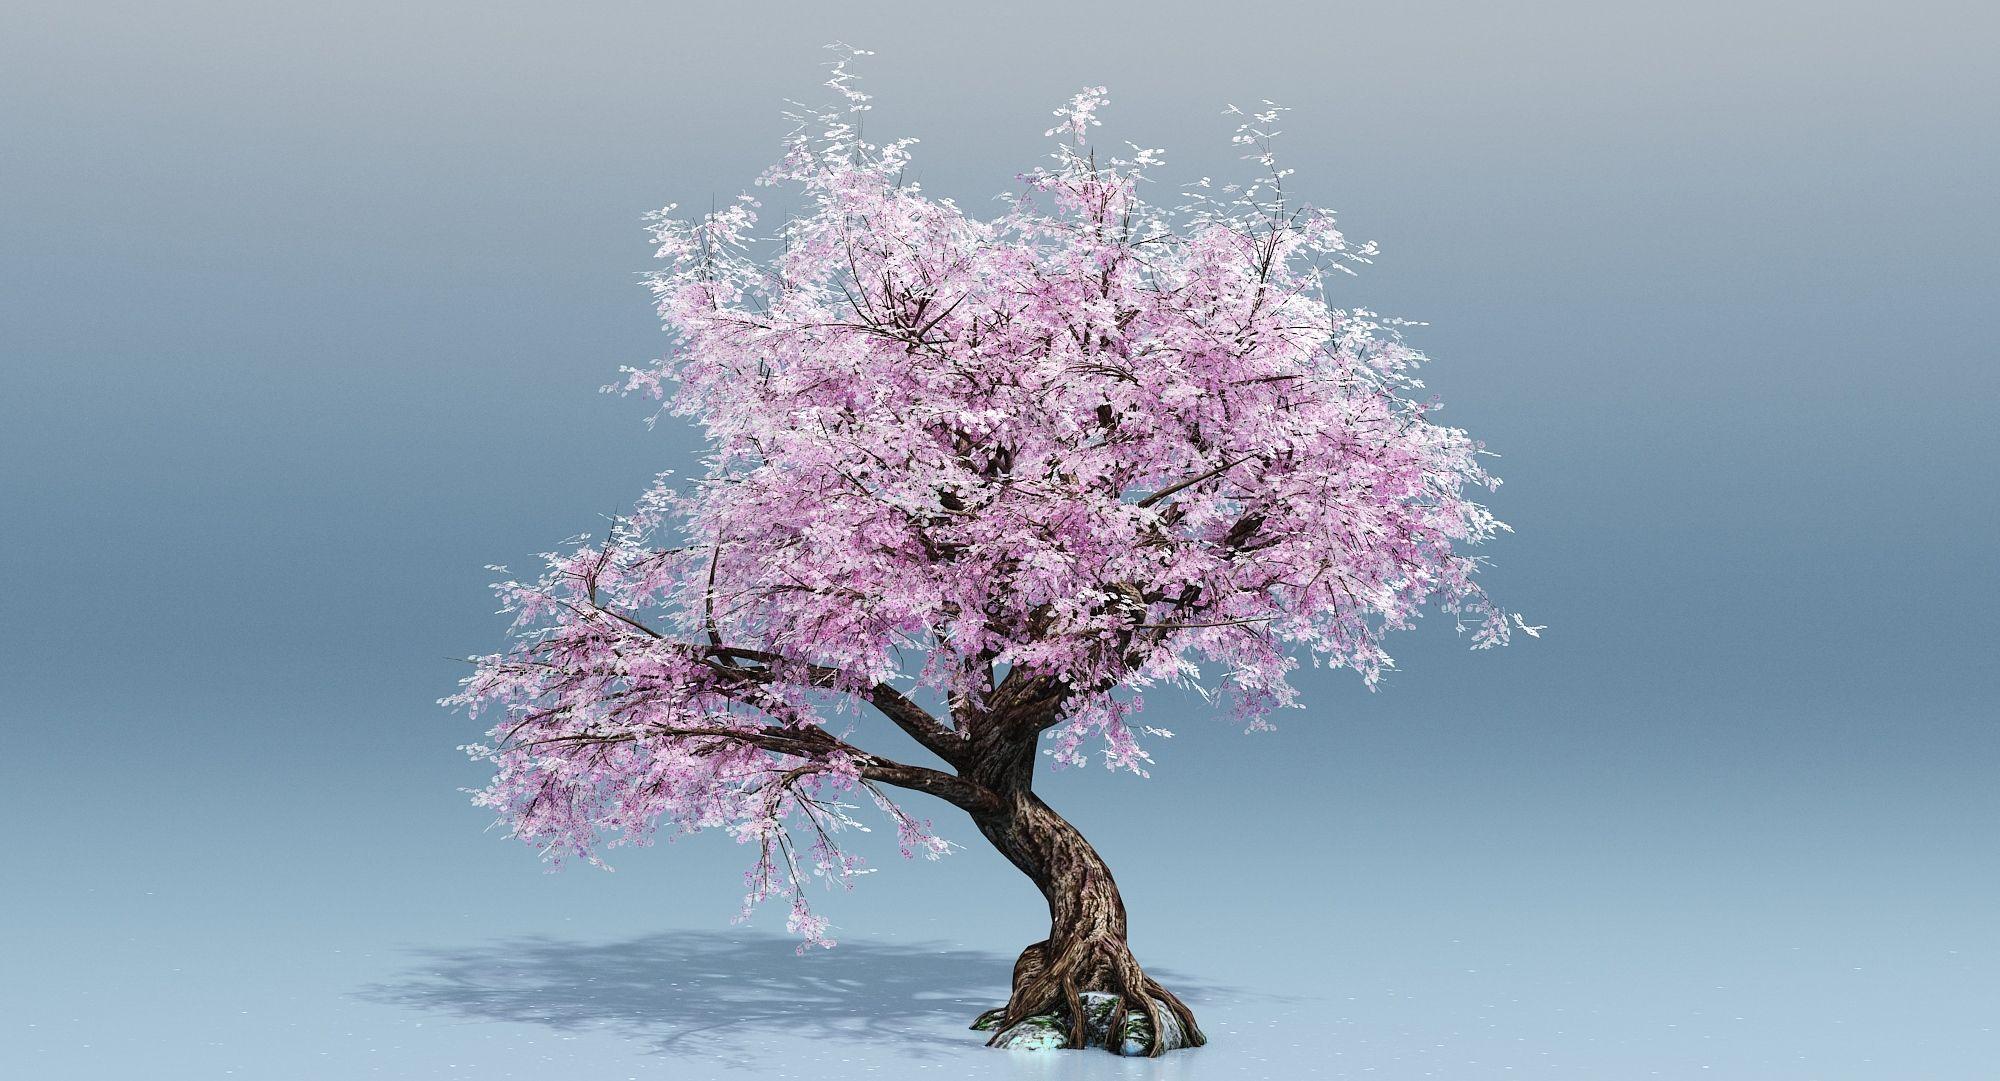 Cherry Blossom Tree 3d Turbosquid 1189864 Cherry Blossom Tree Cherry Blossom Drawing Cherry Blossom Tree Tattoo